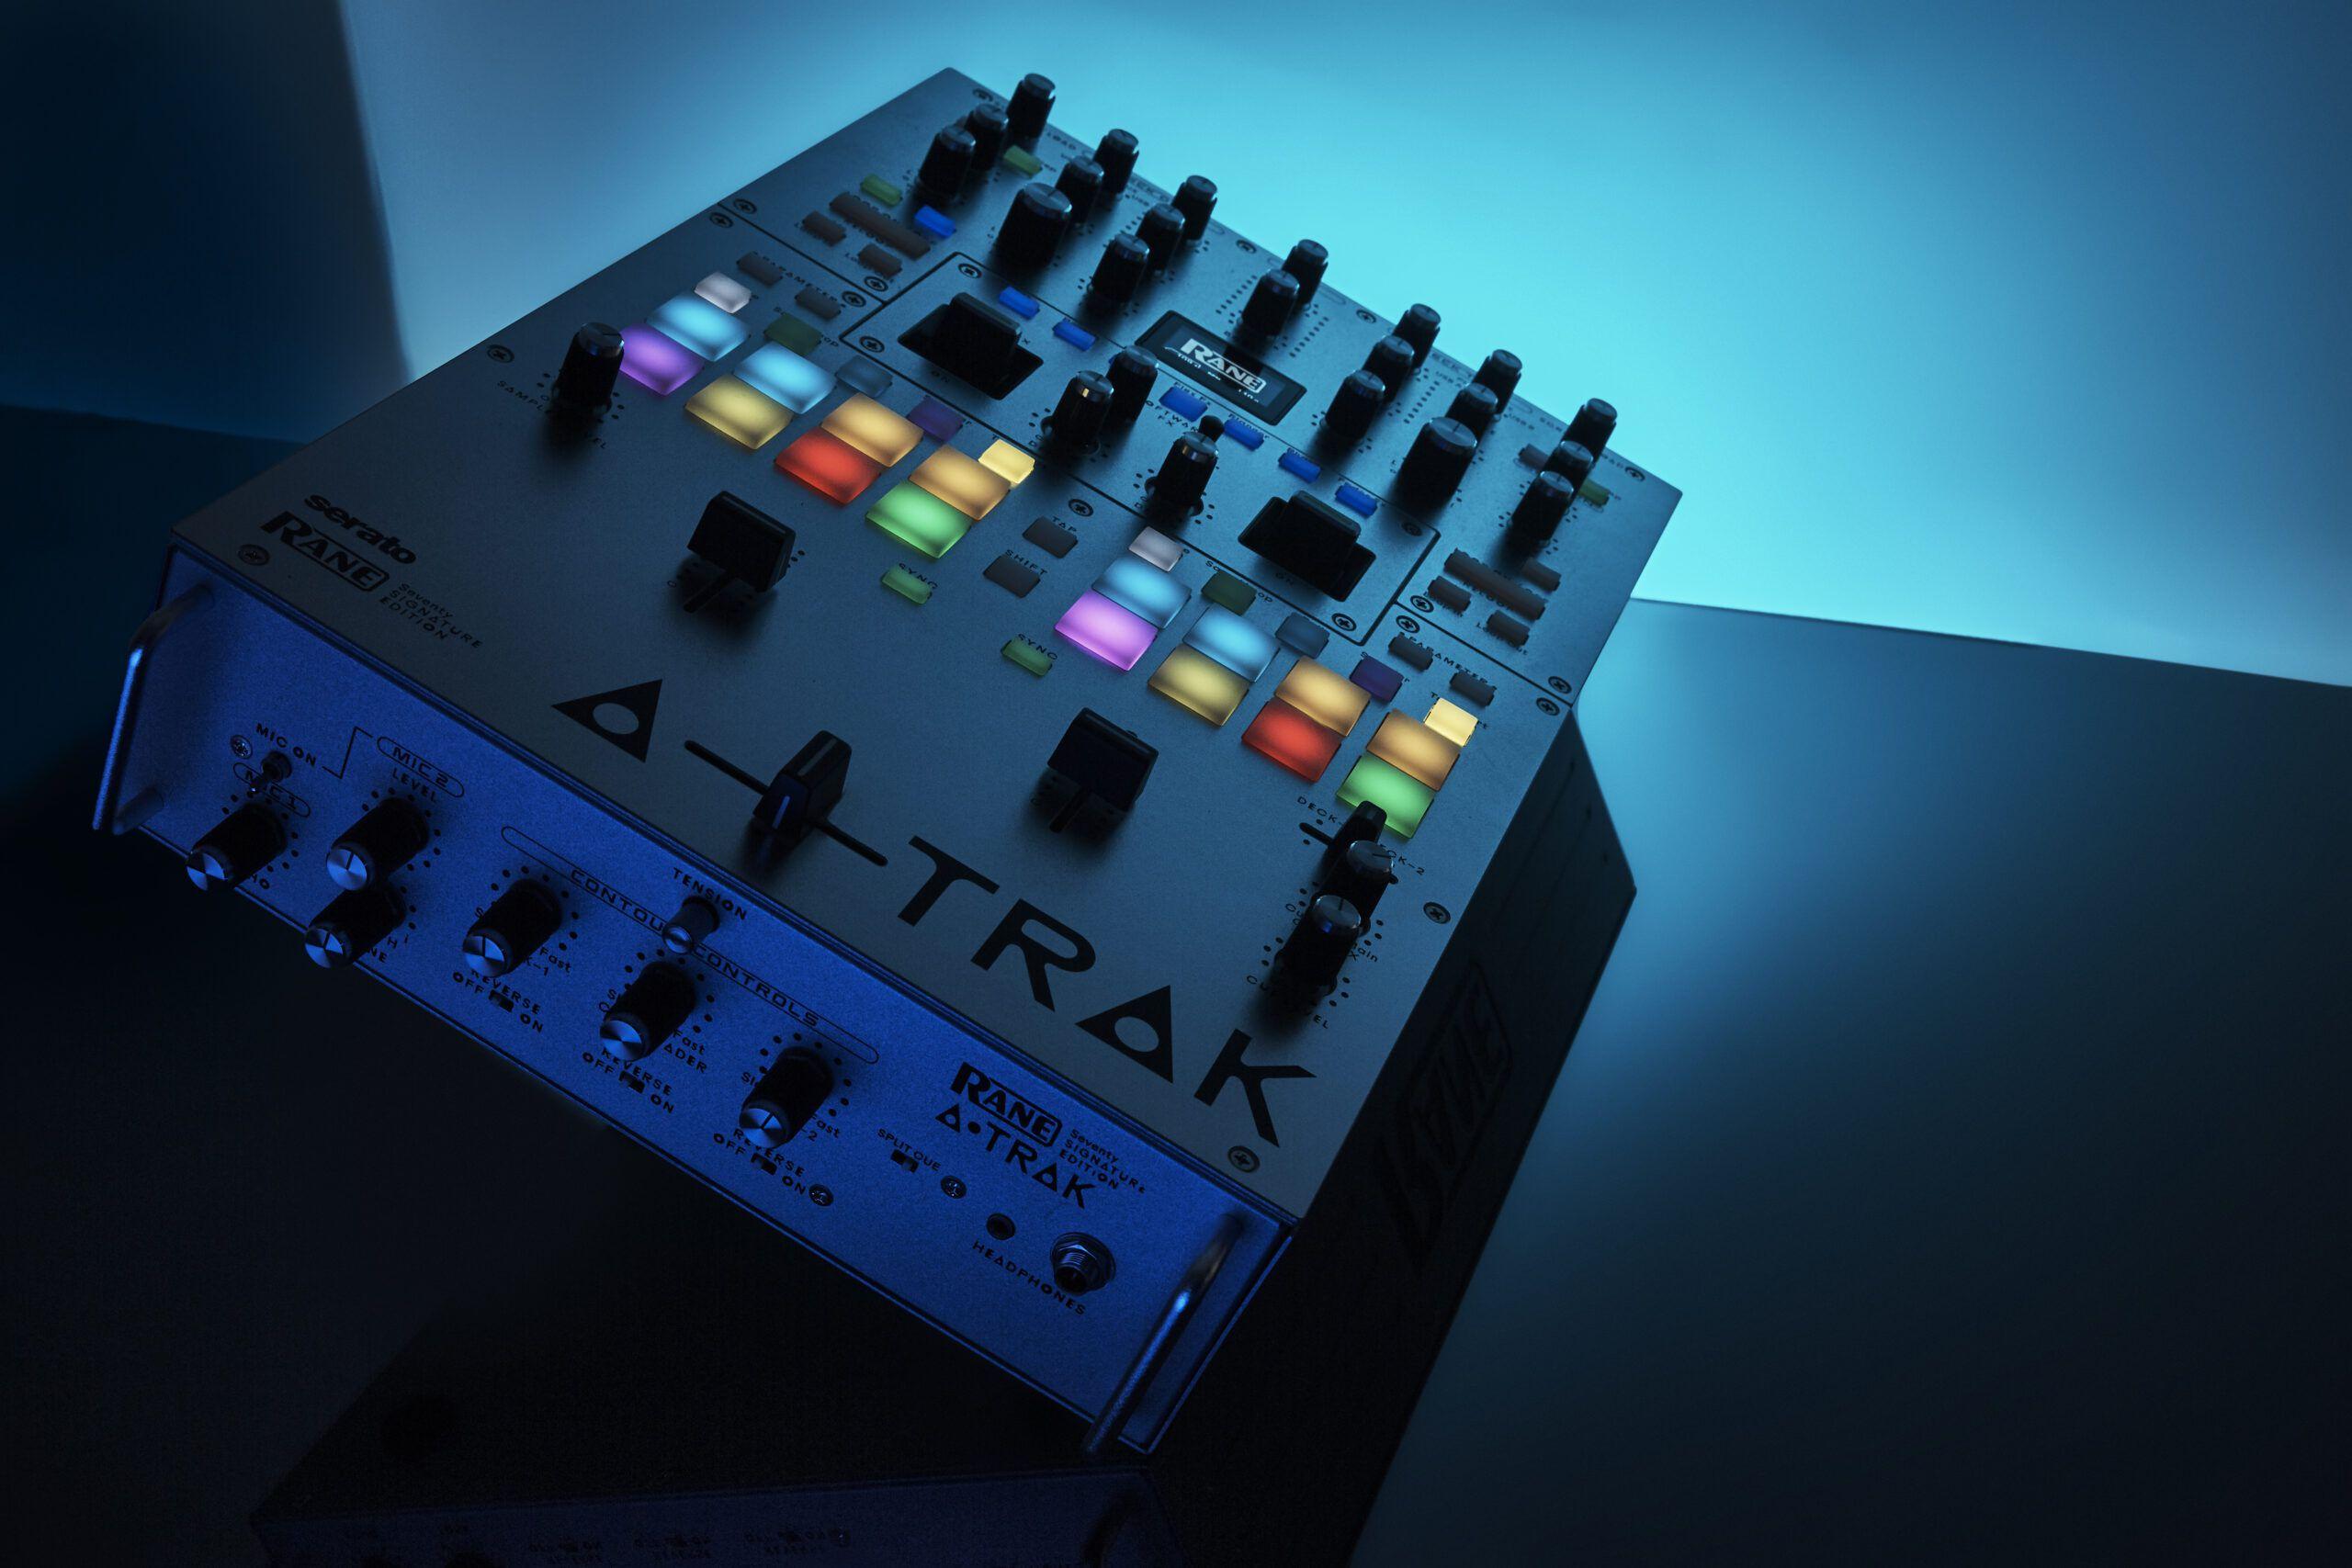 Rane releases an A-Trak Signature Edition of the Seventy battle mixer